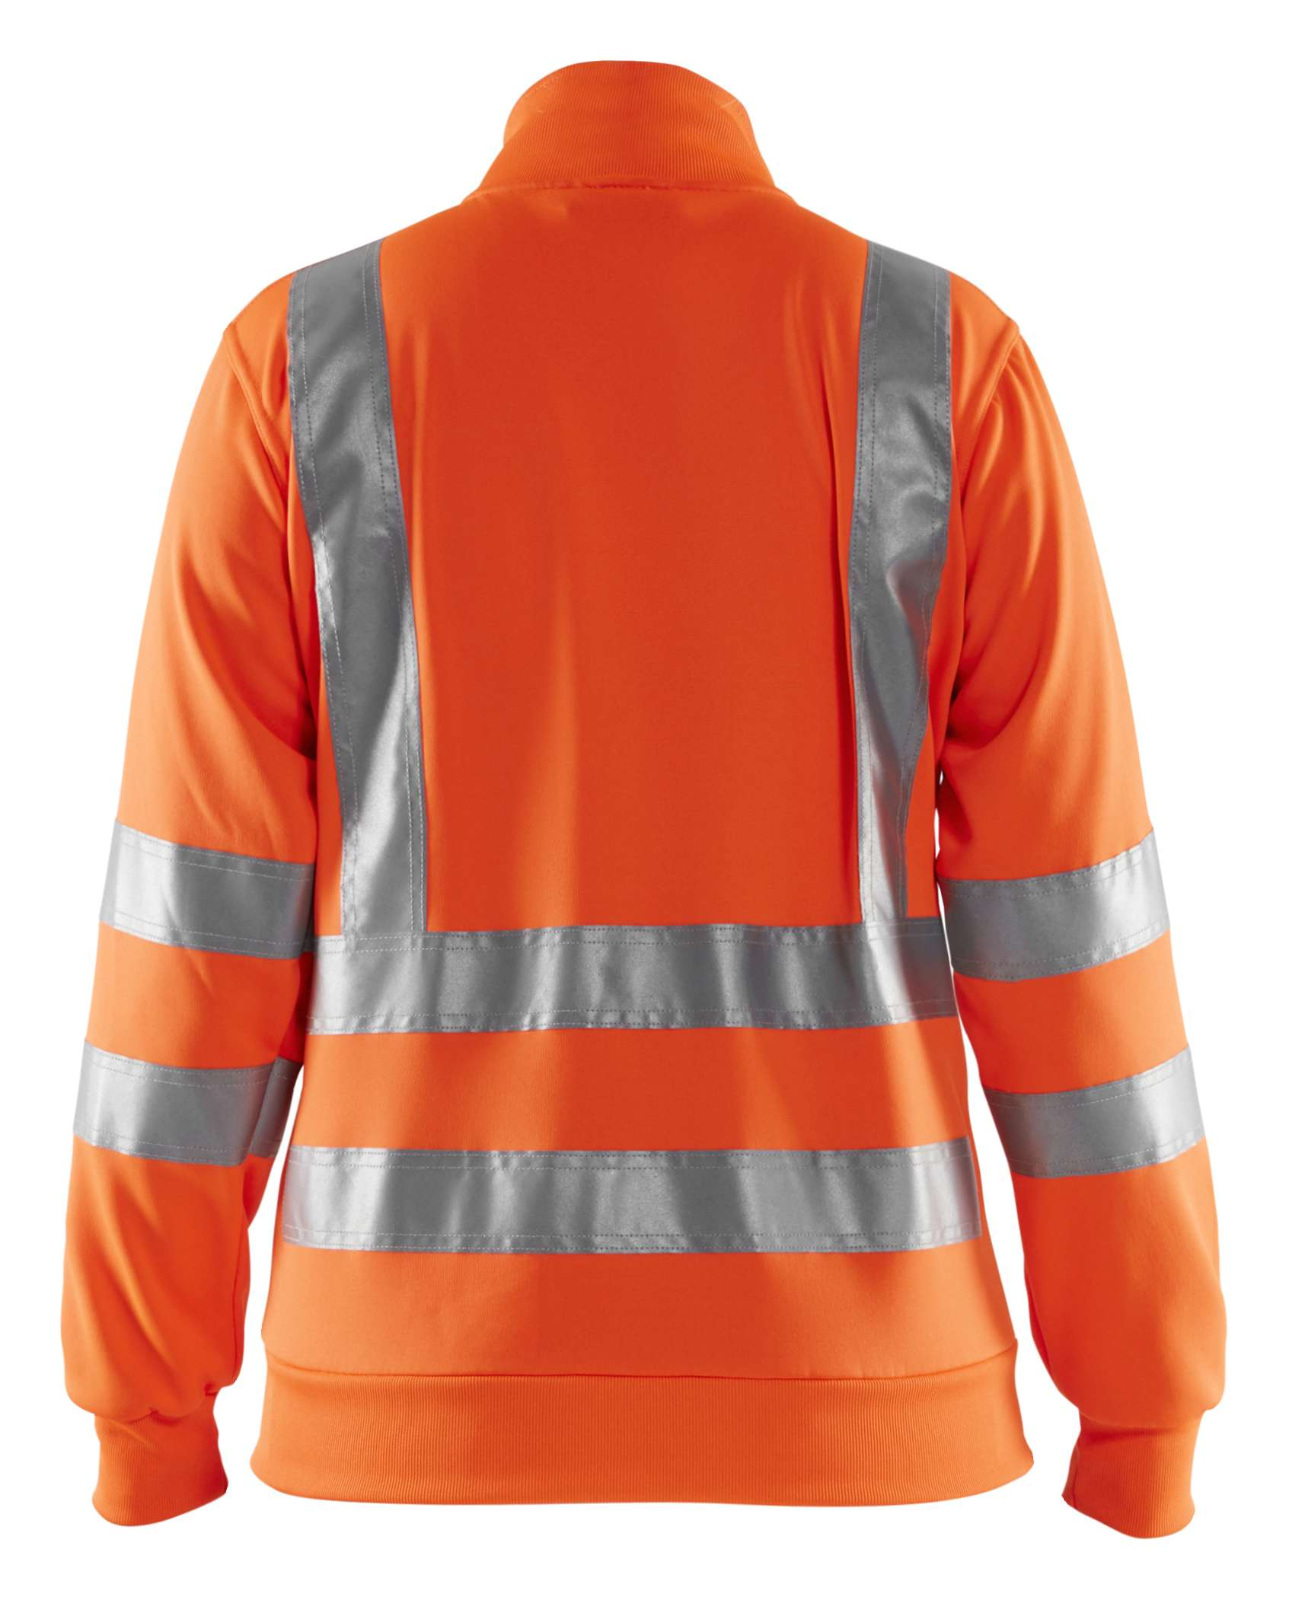 Blaklader Dames sweatvesten 33081974 High Vis fluo-oranje(5300)